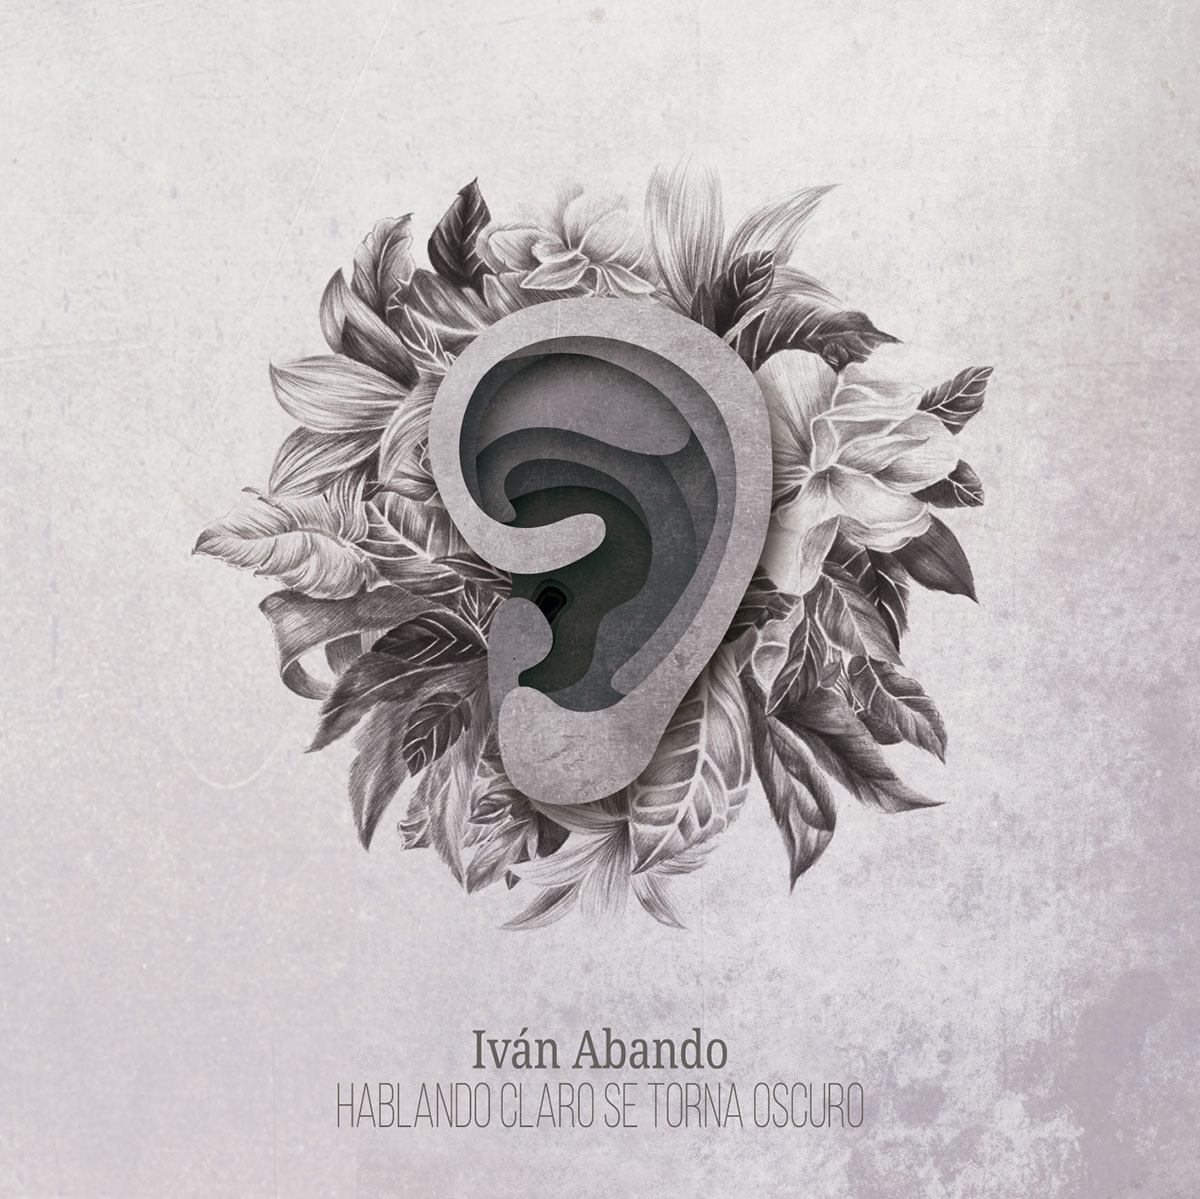 Diseño para disco del rapero zaragozano Ivan Abando Por Laranoia